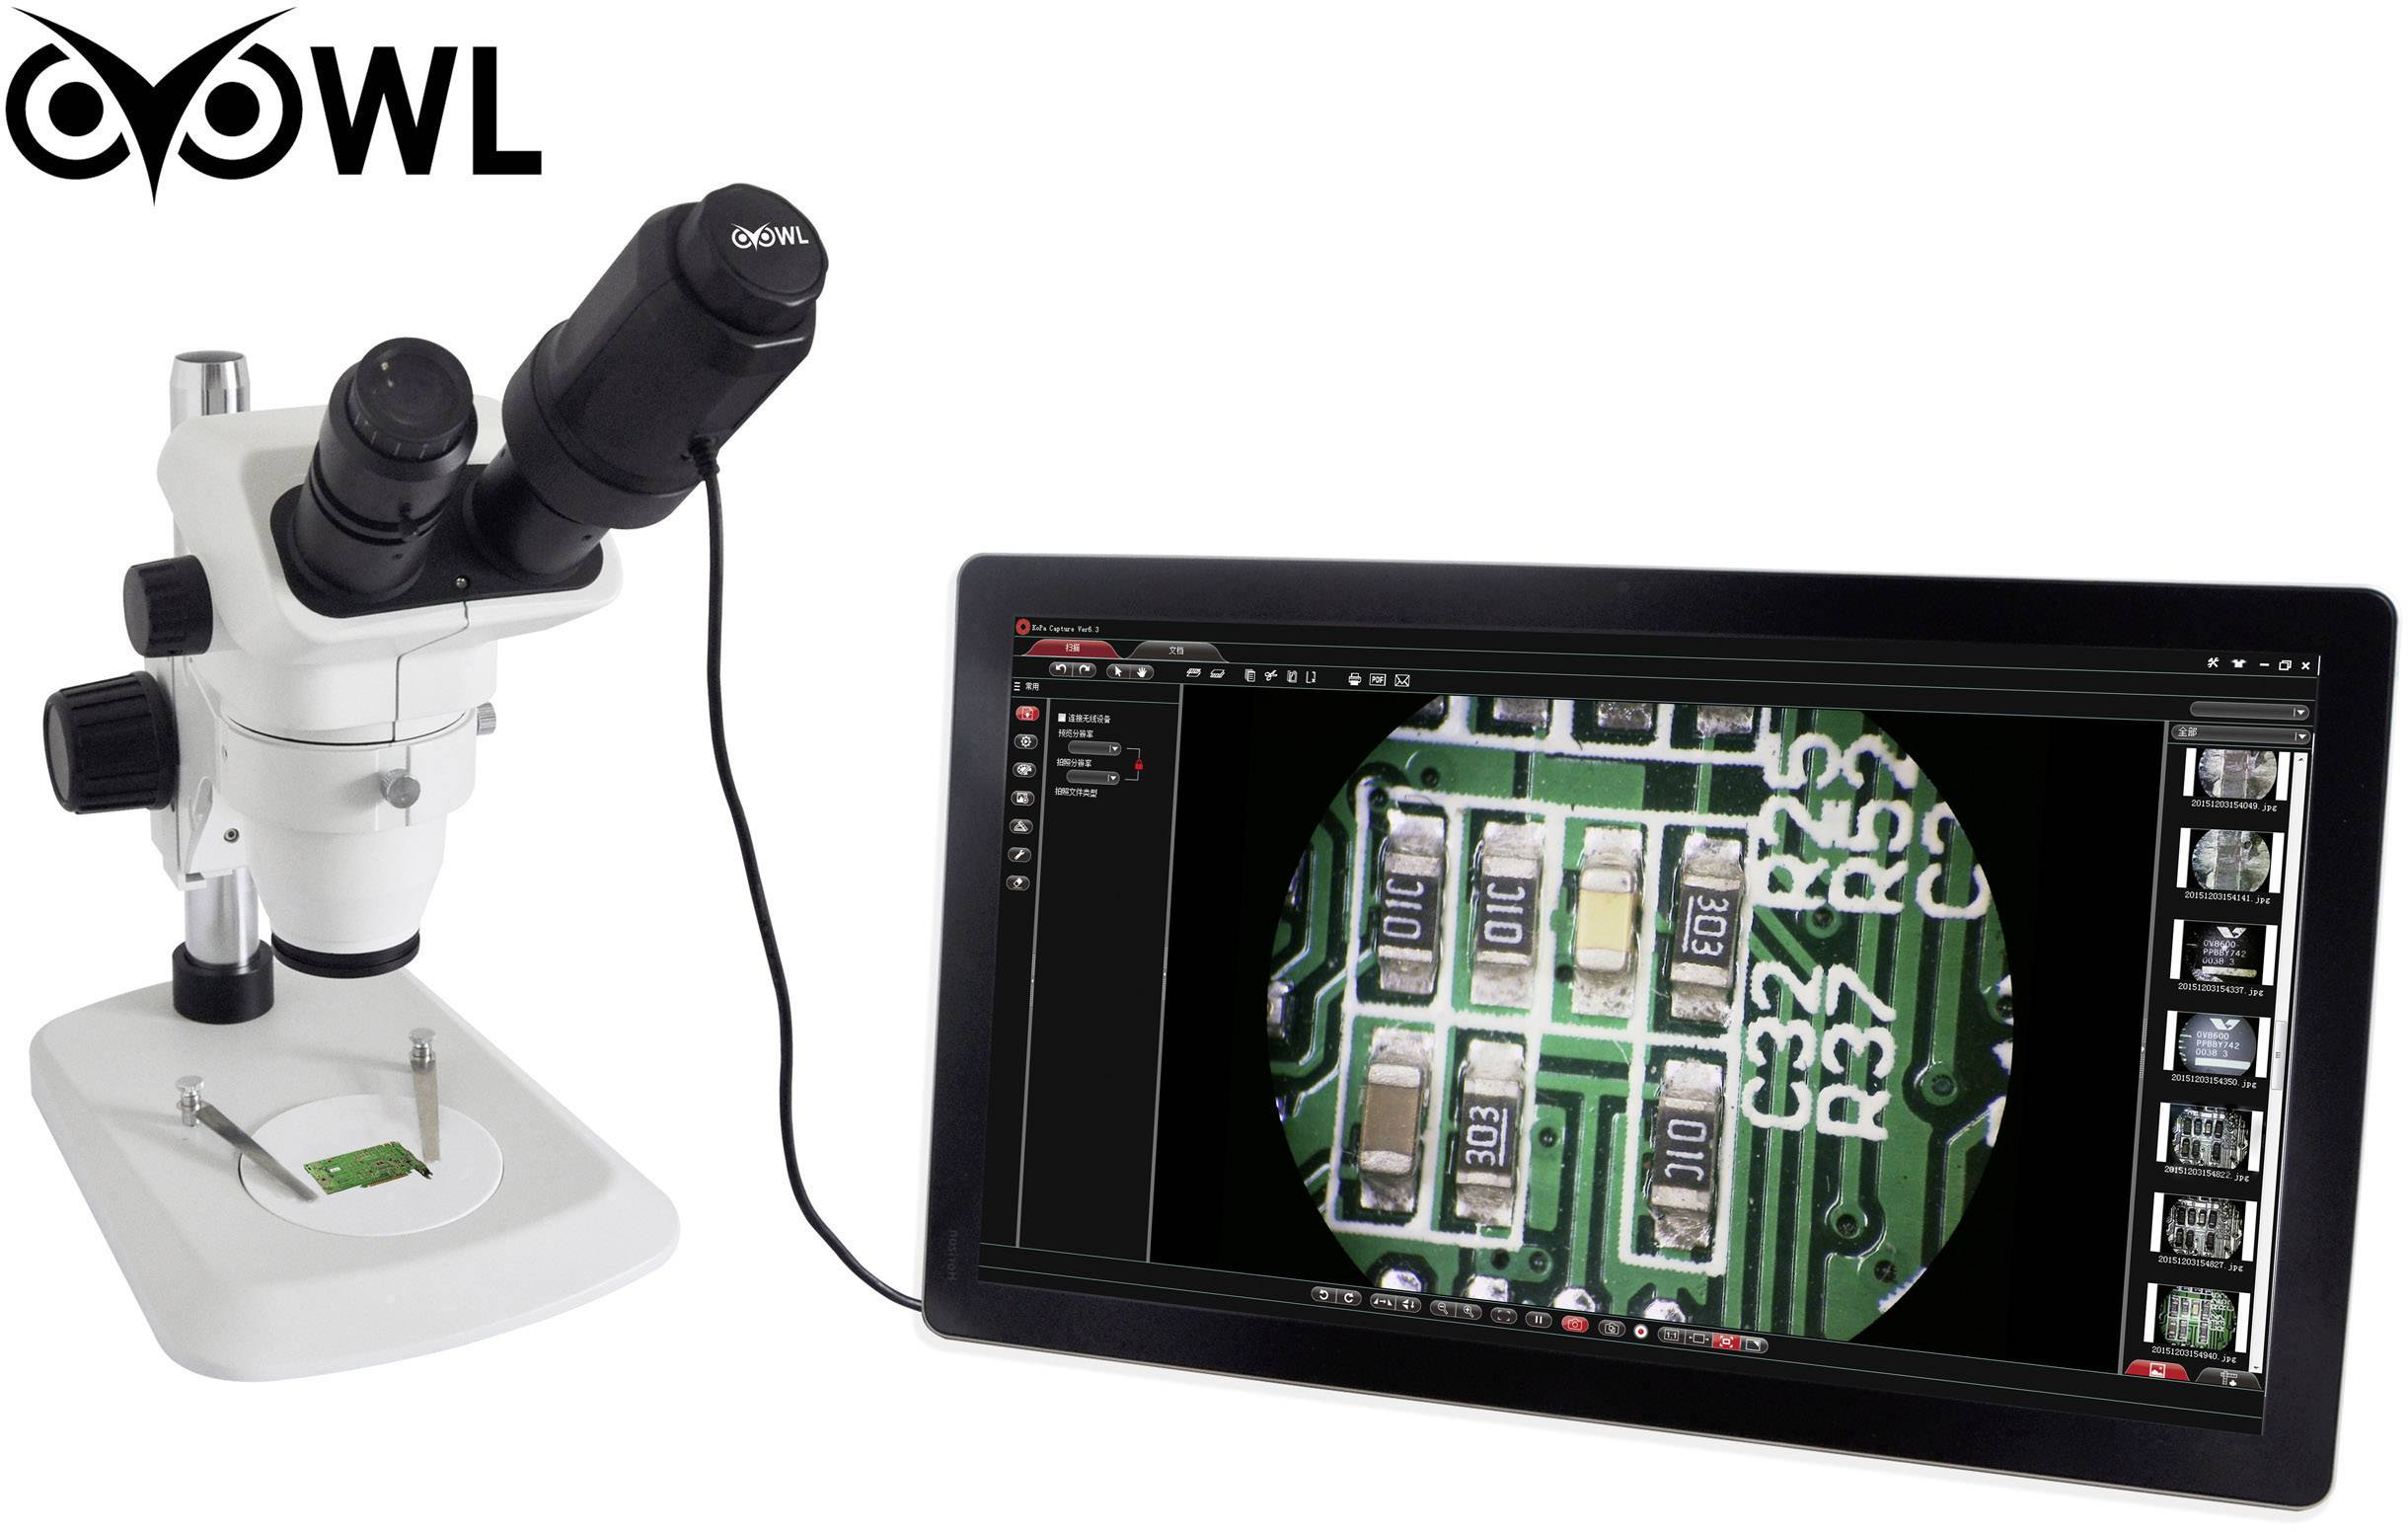 Mikroskop kamerası: beste verkauf ndpl können nicht eos mikroskop